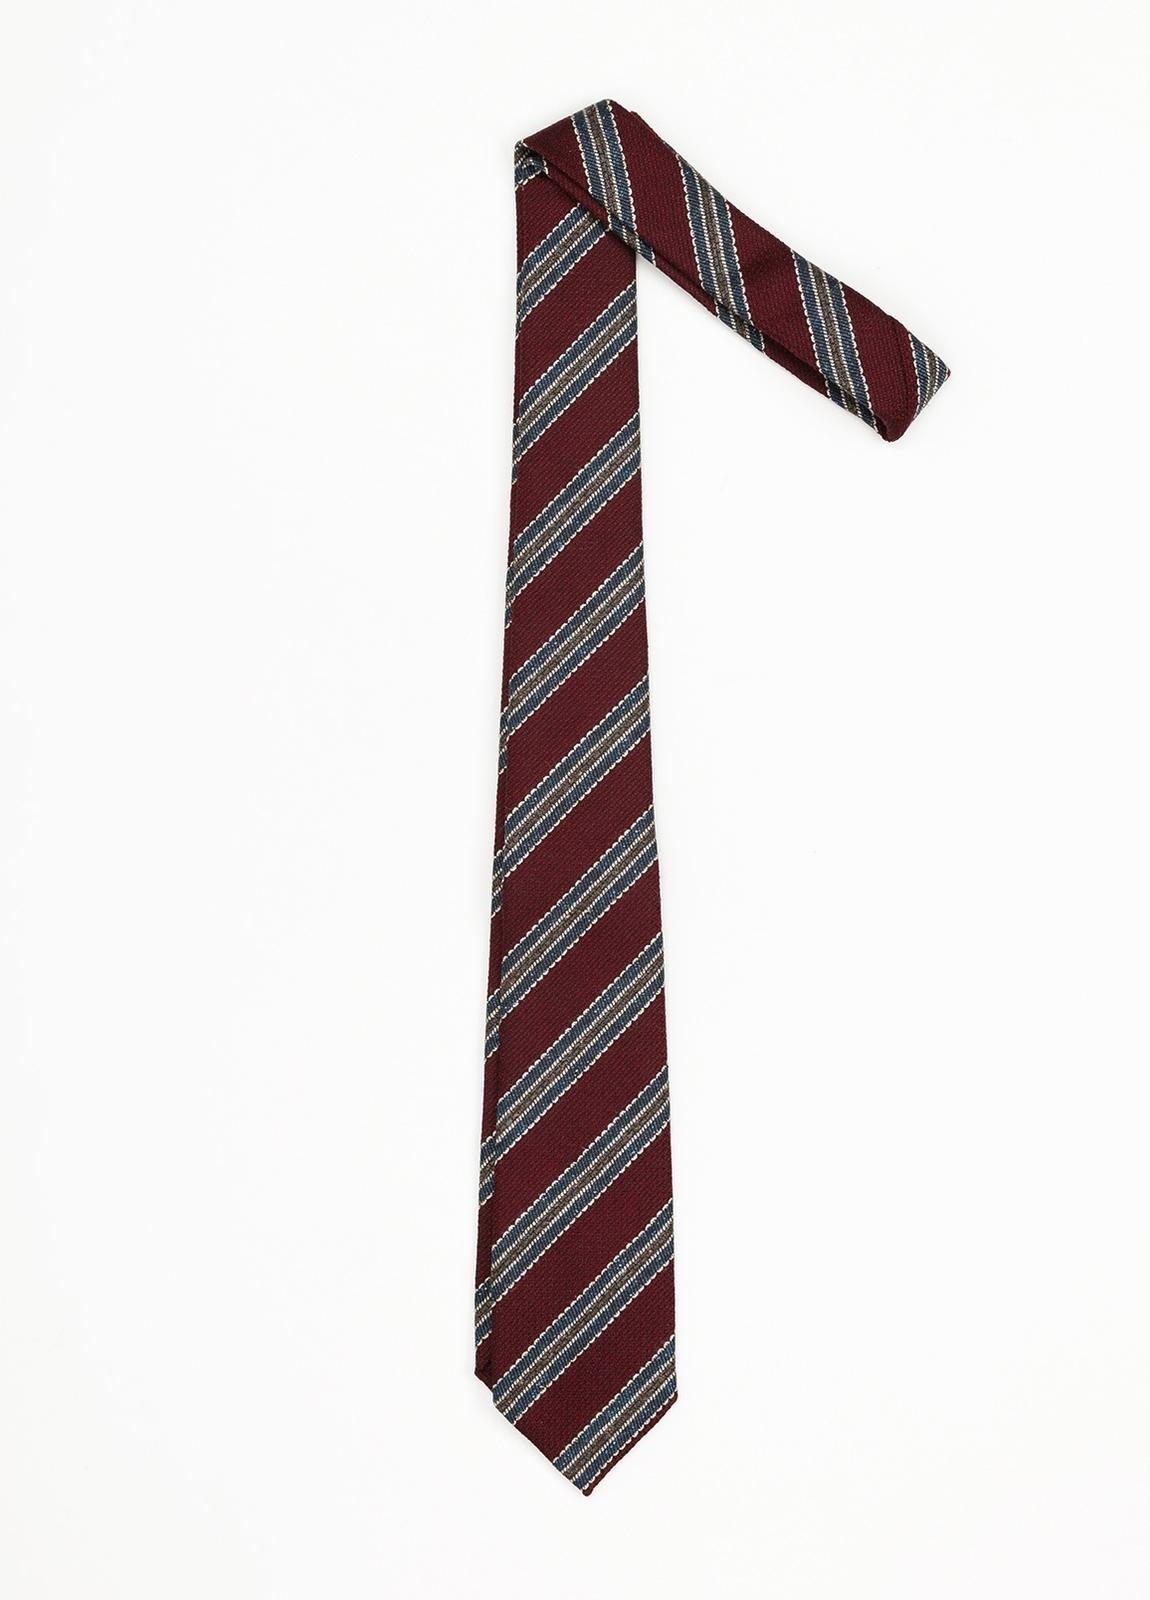 Corbata Formal Wear rayas diagonales, color granate. Pala 7,5 cm. 70% Lana 30% Seda.